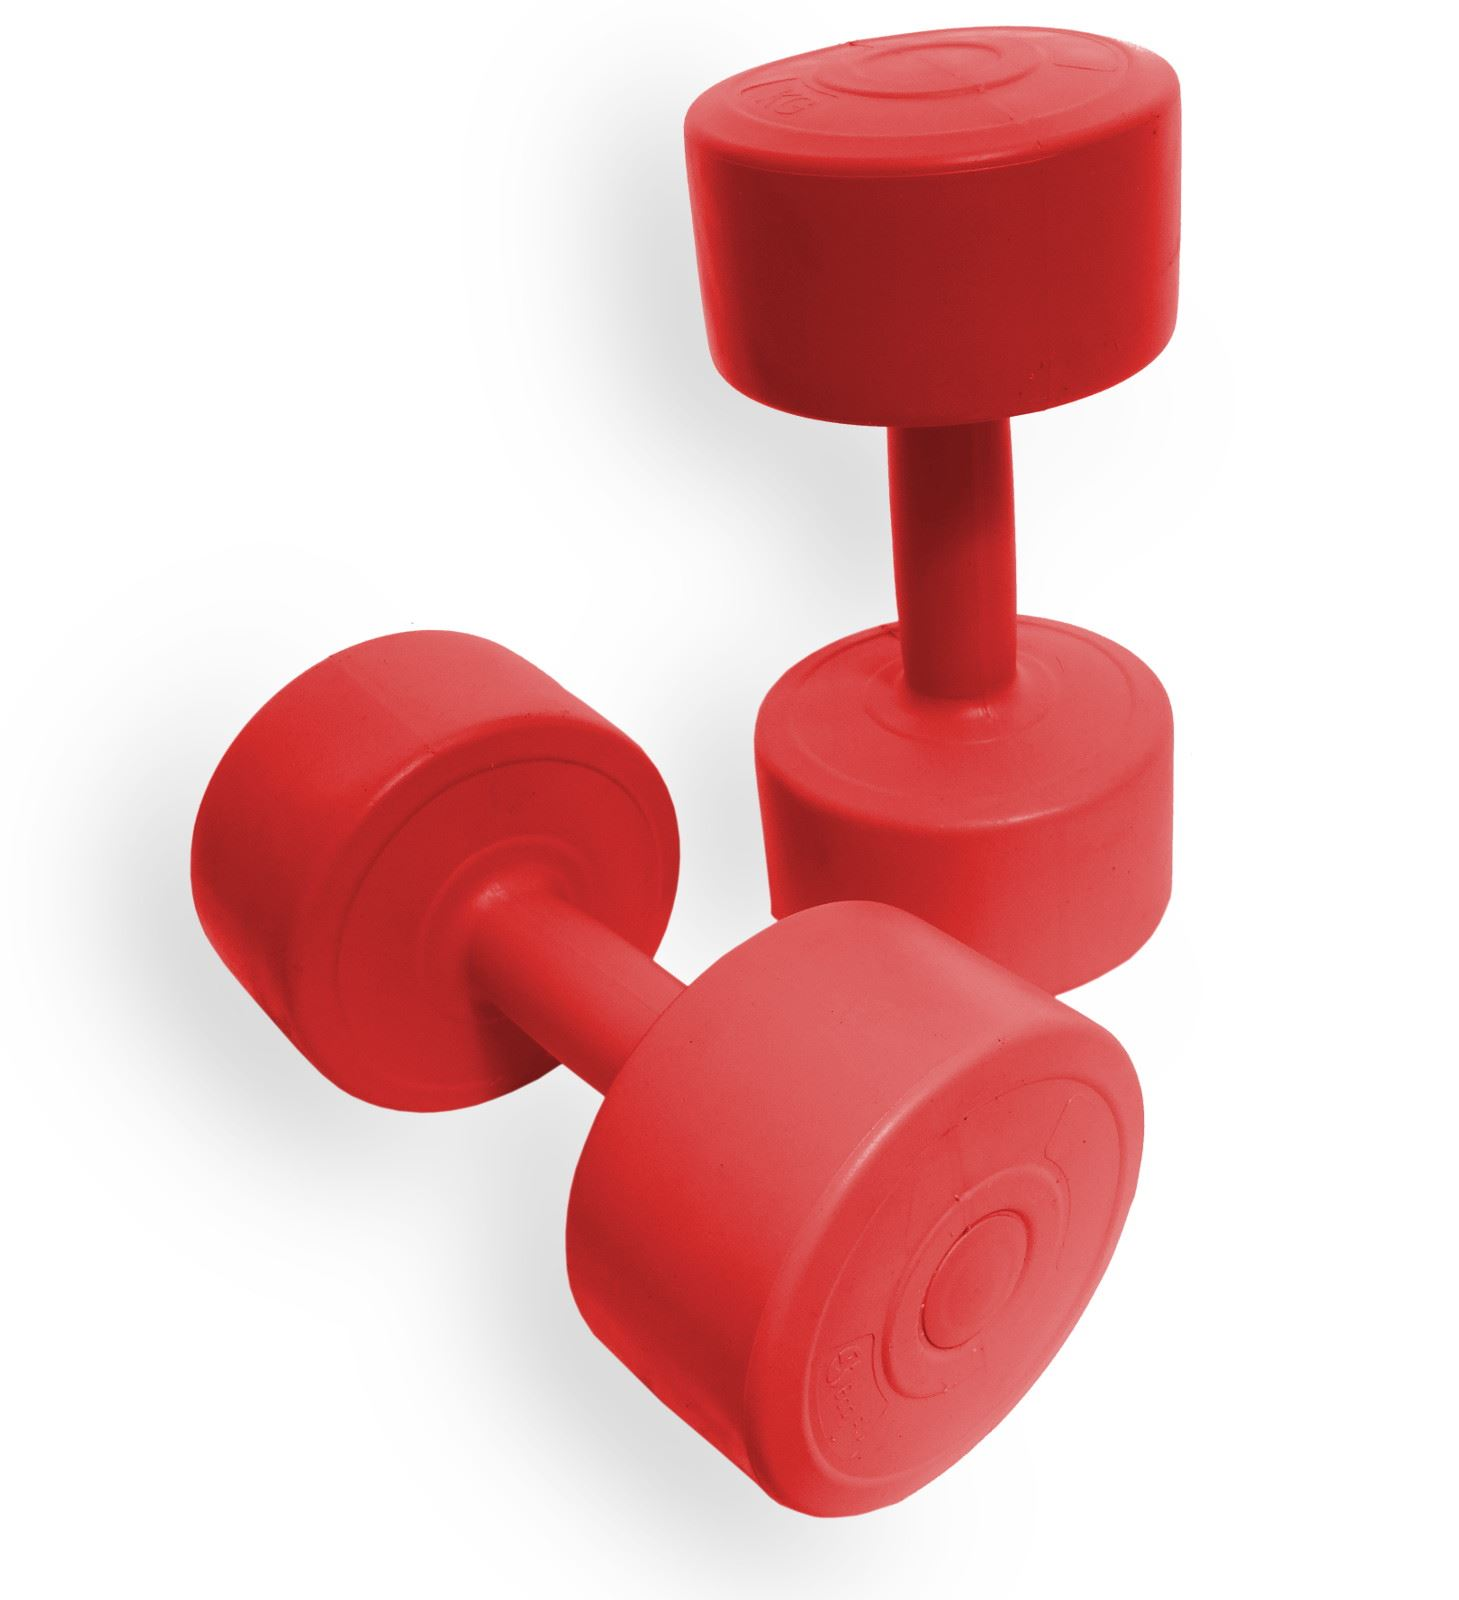 BodyRip-Hand-Weights-Dumbbells-Vinyl-Dumbells-Set-Home-Fitness-Exercise-Ladies